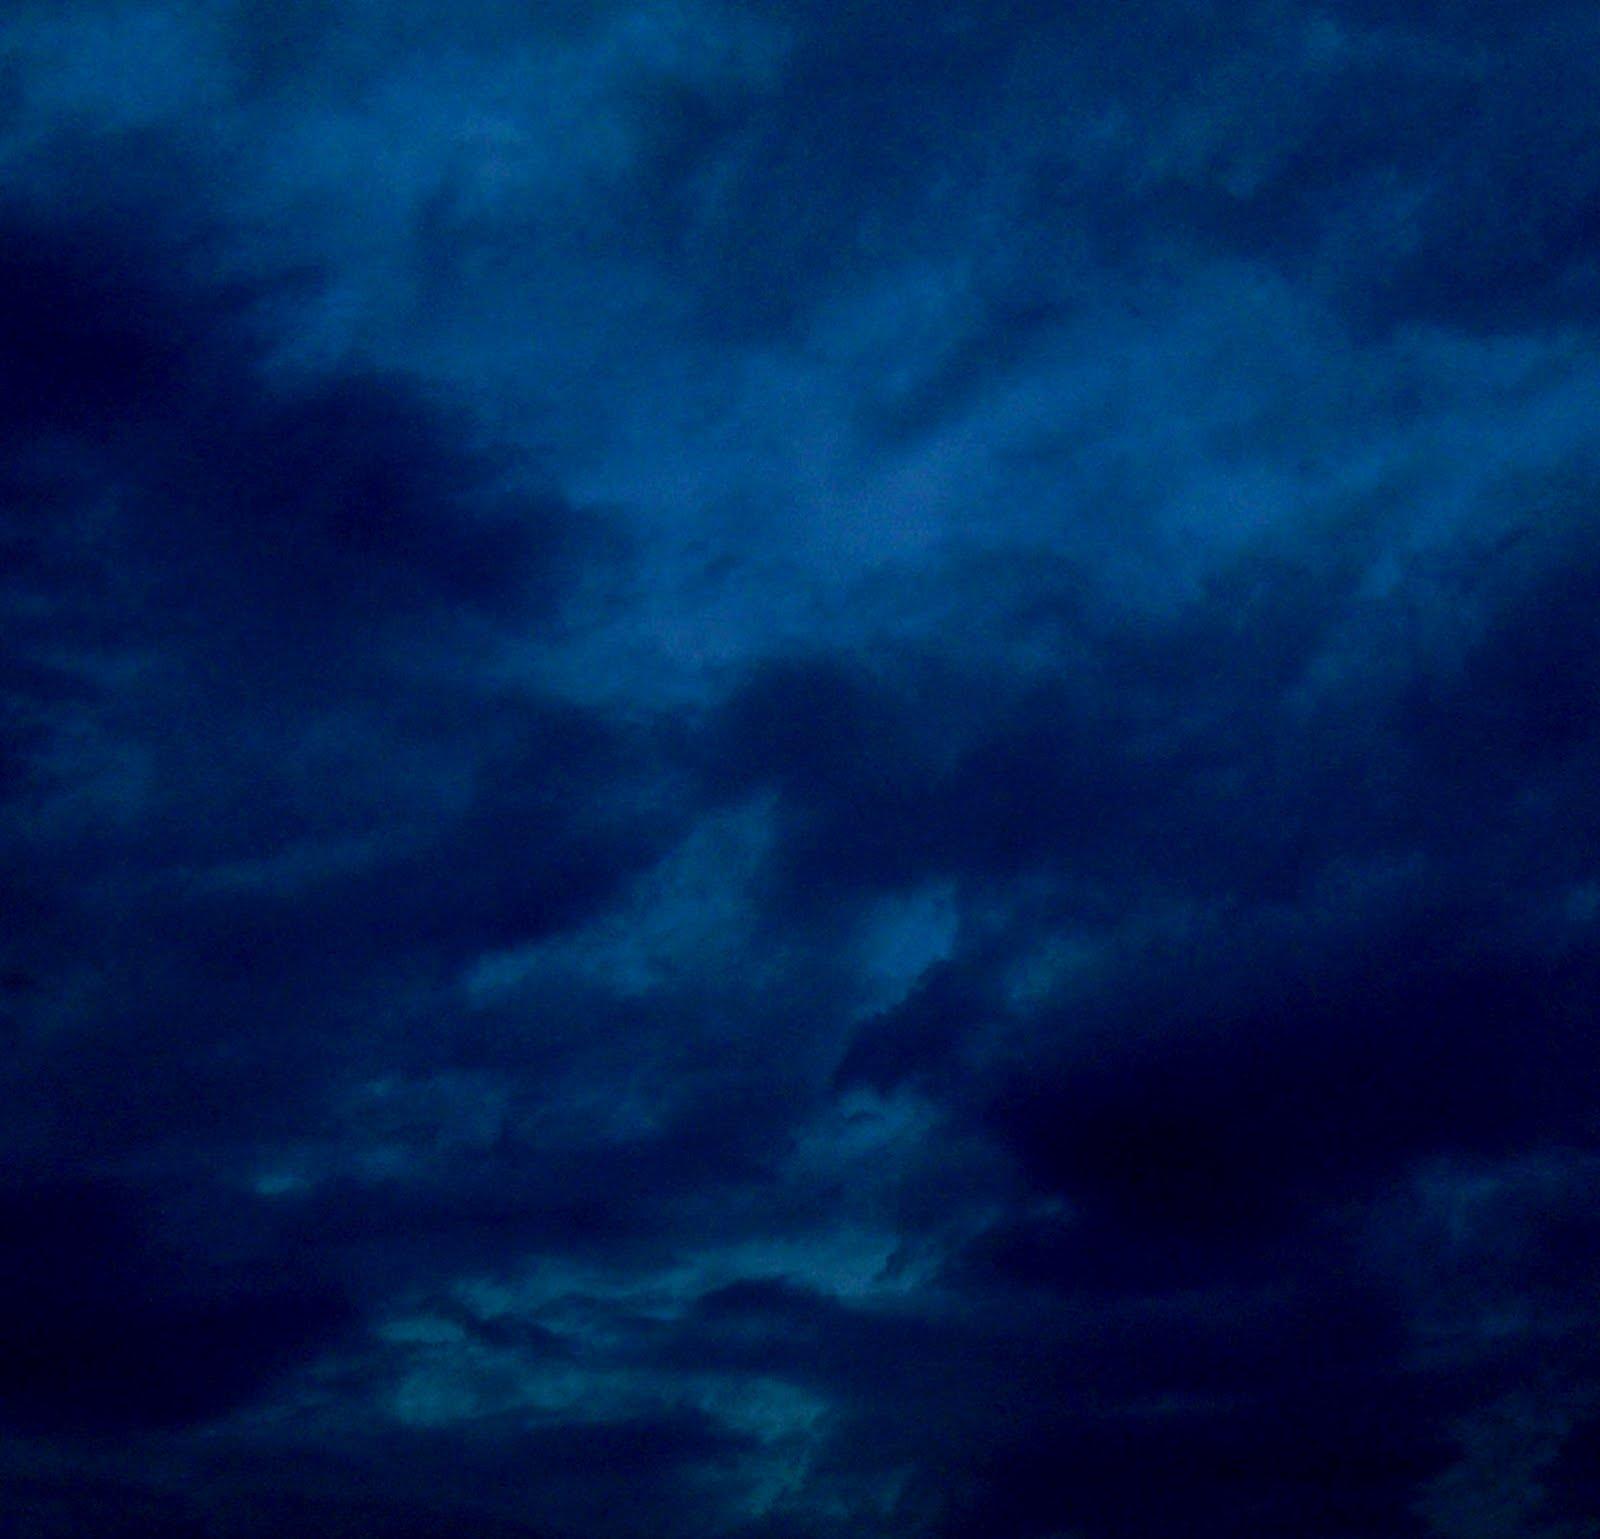 http://2.bp.blogspot.com/-jVkLKdA-7b4/T5IlCNX117I/AAAAAAAAHr0/piB6Jk1nvzo/s1600/a-piece-of-sky-NTL-2012.jpg